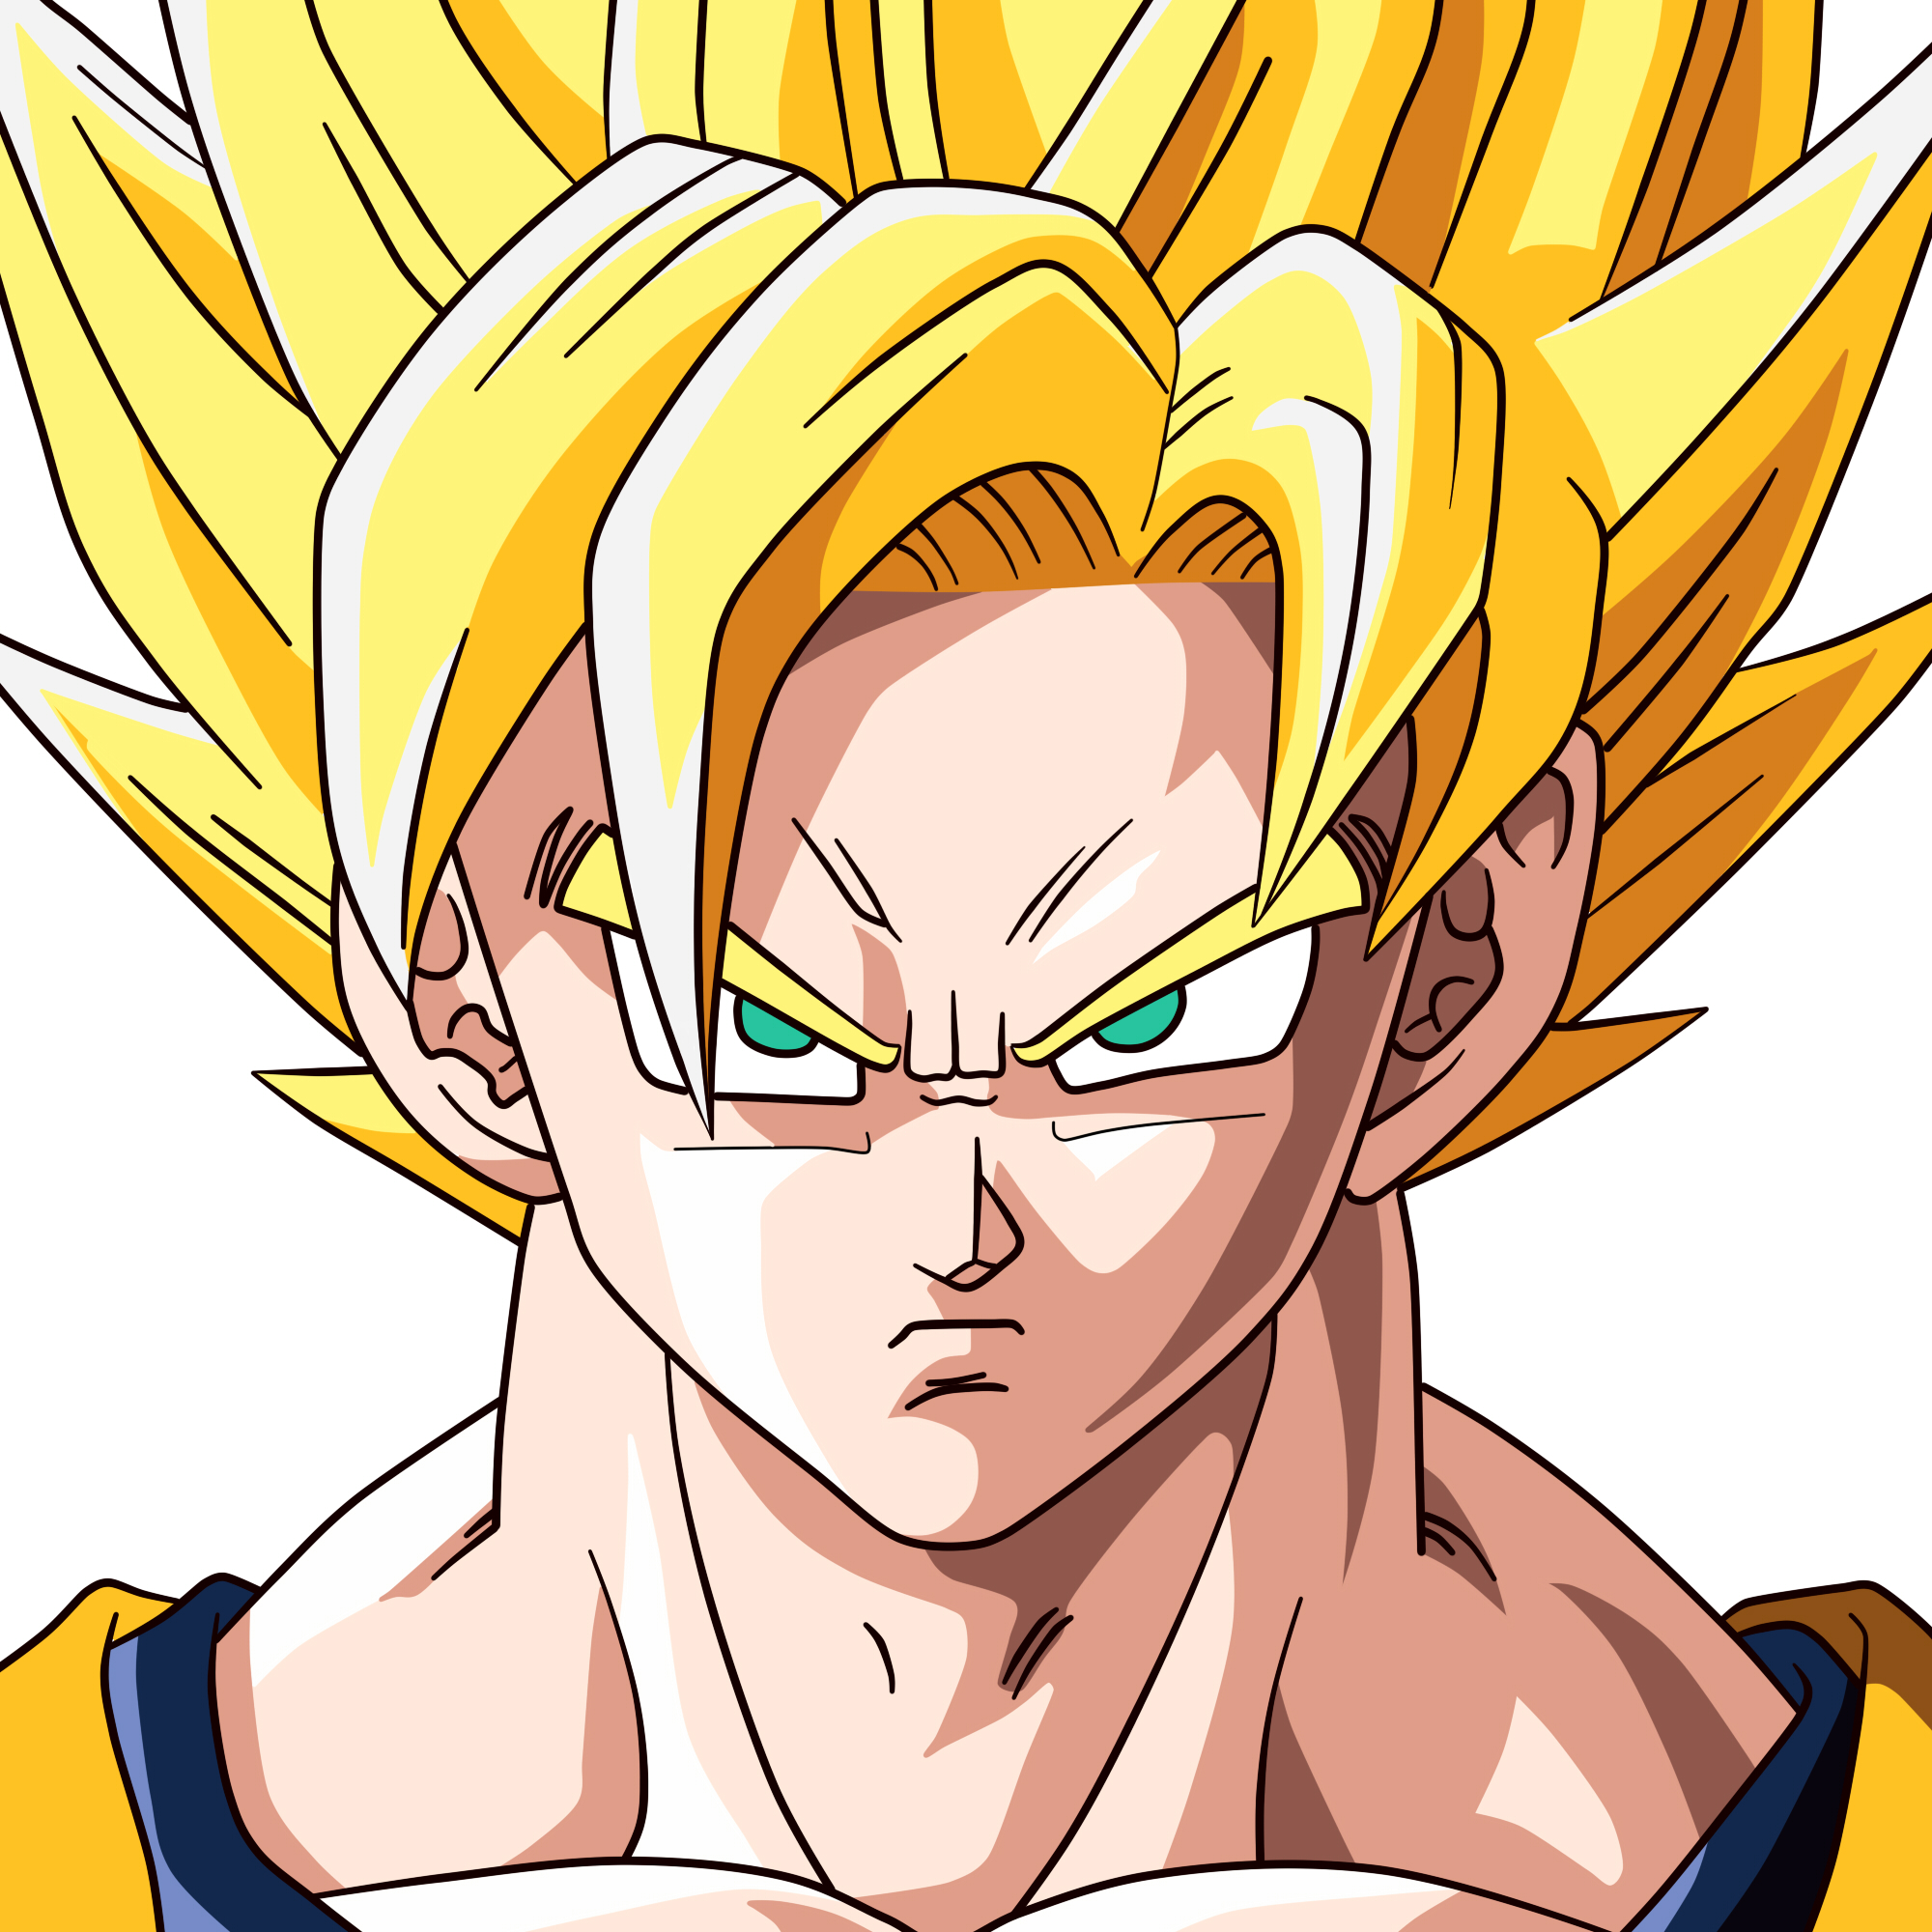 Goku super saiyan by jeffthesupersaiyan on deviantart - Goku super sayen ...